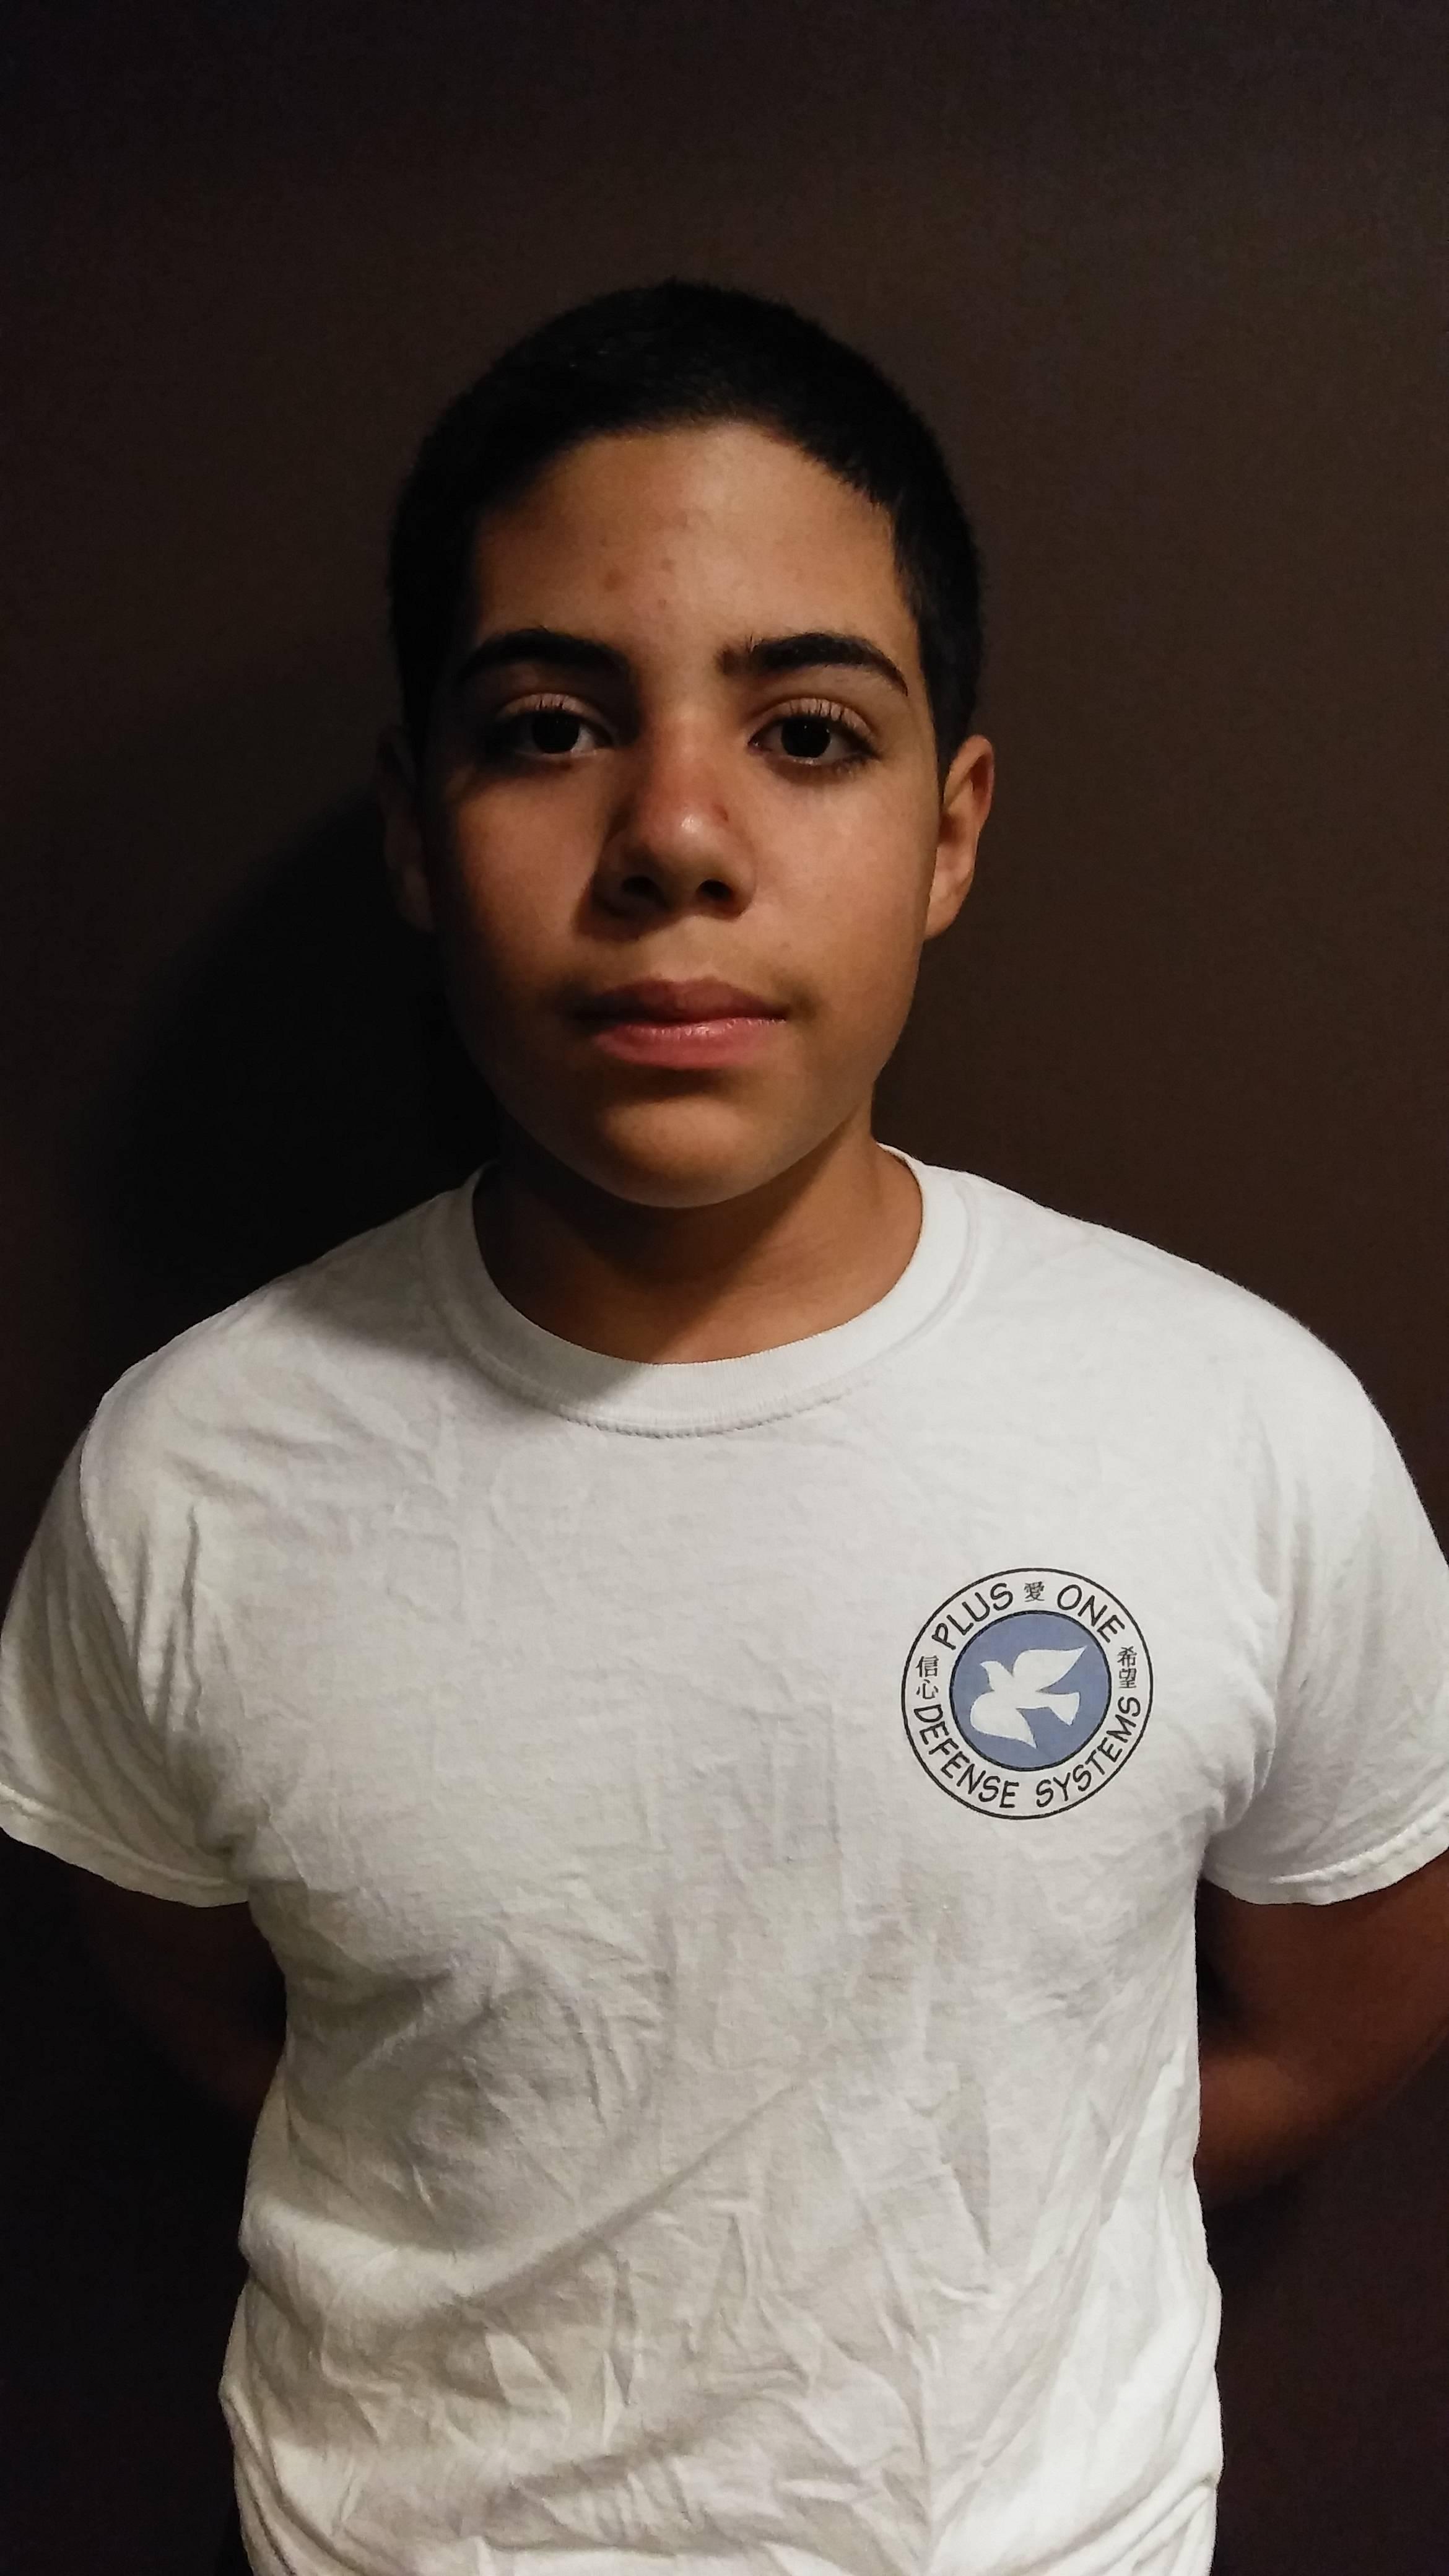 Carlos Ruiz – 1st Degree Youth Black Belt